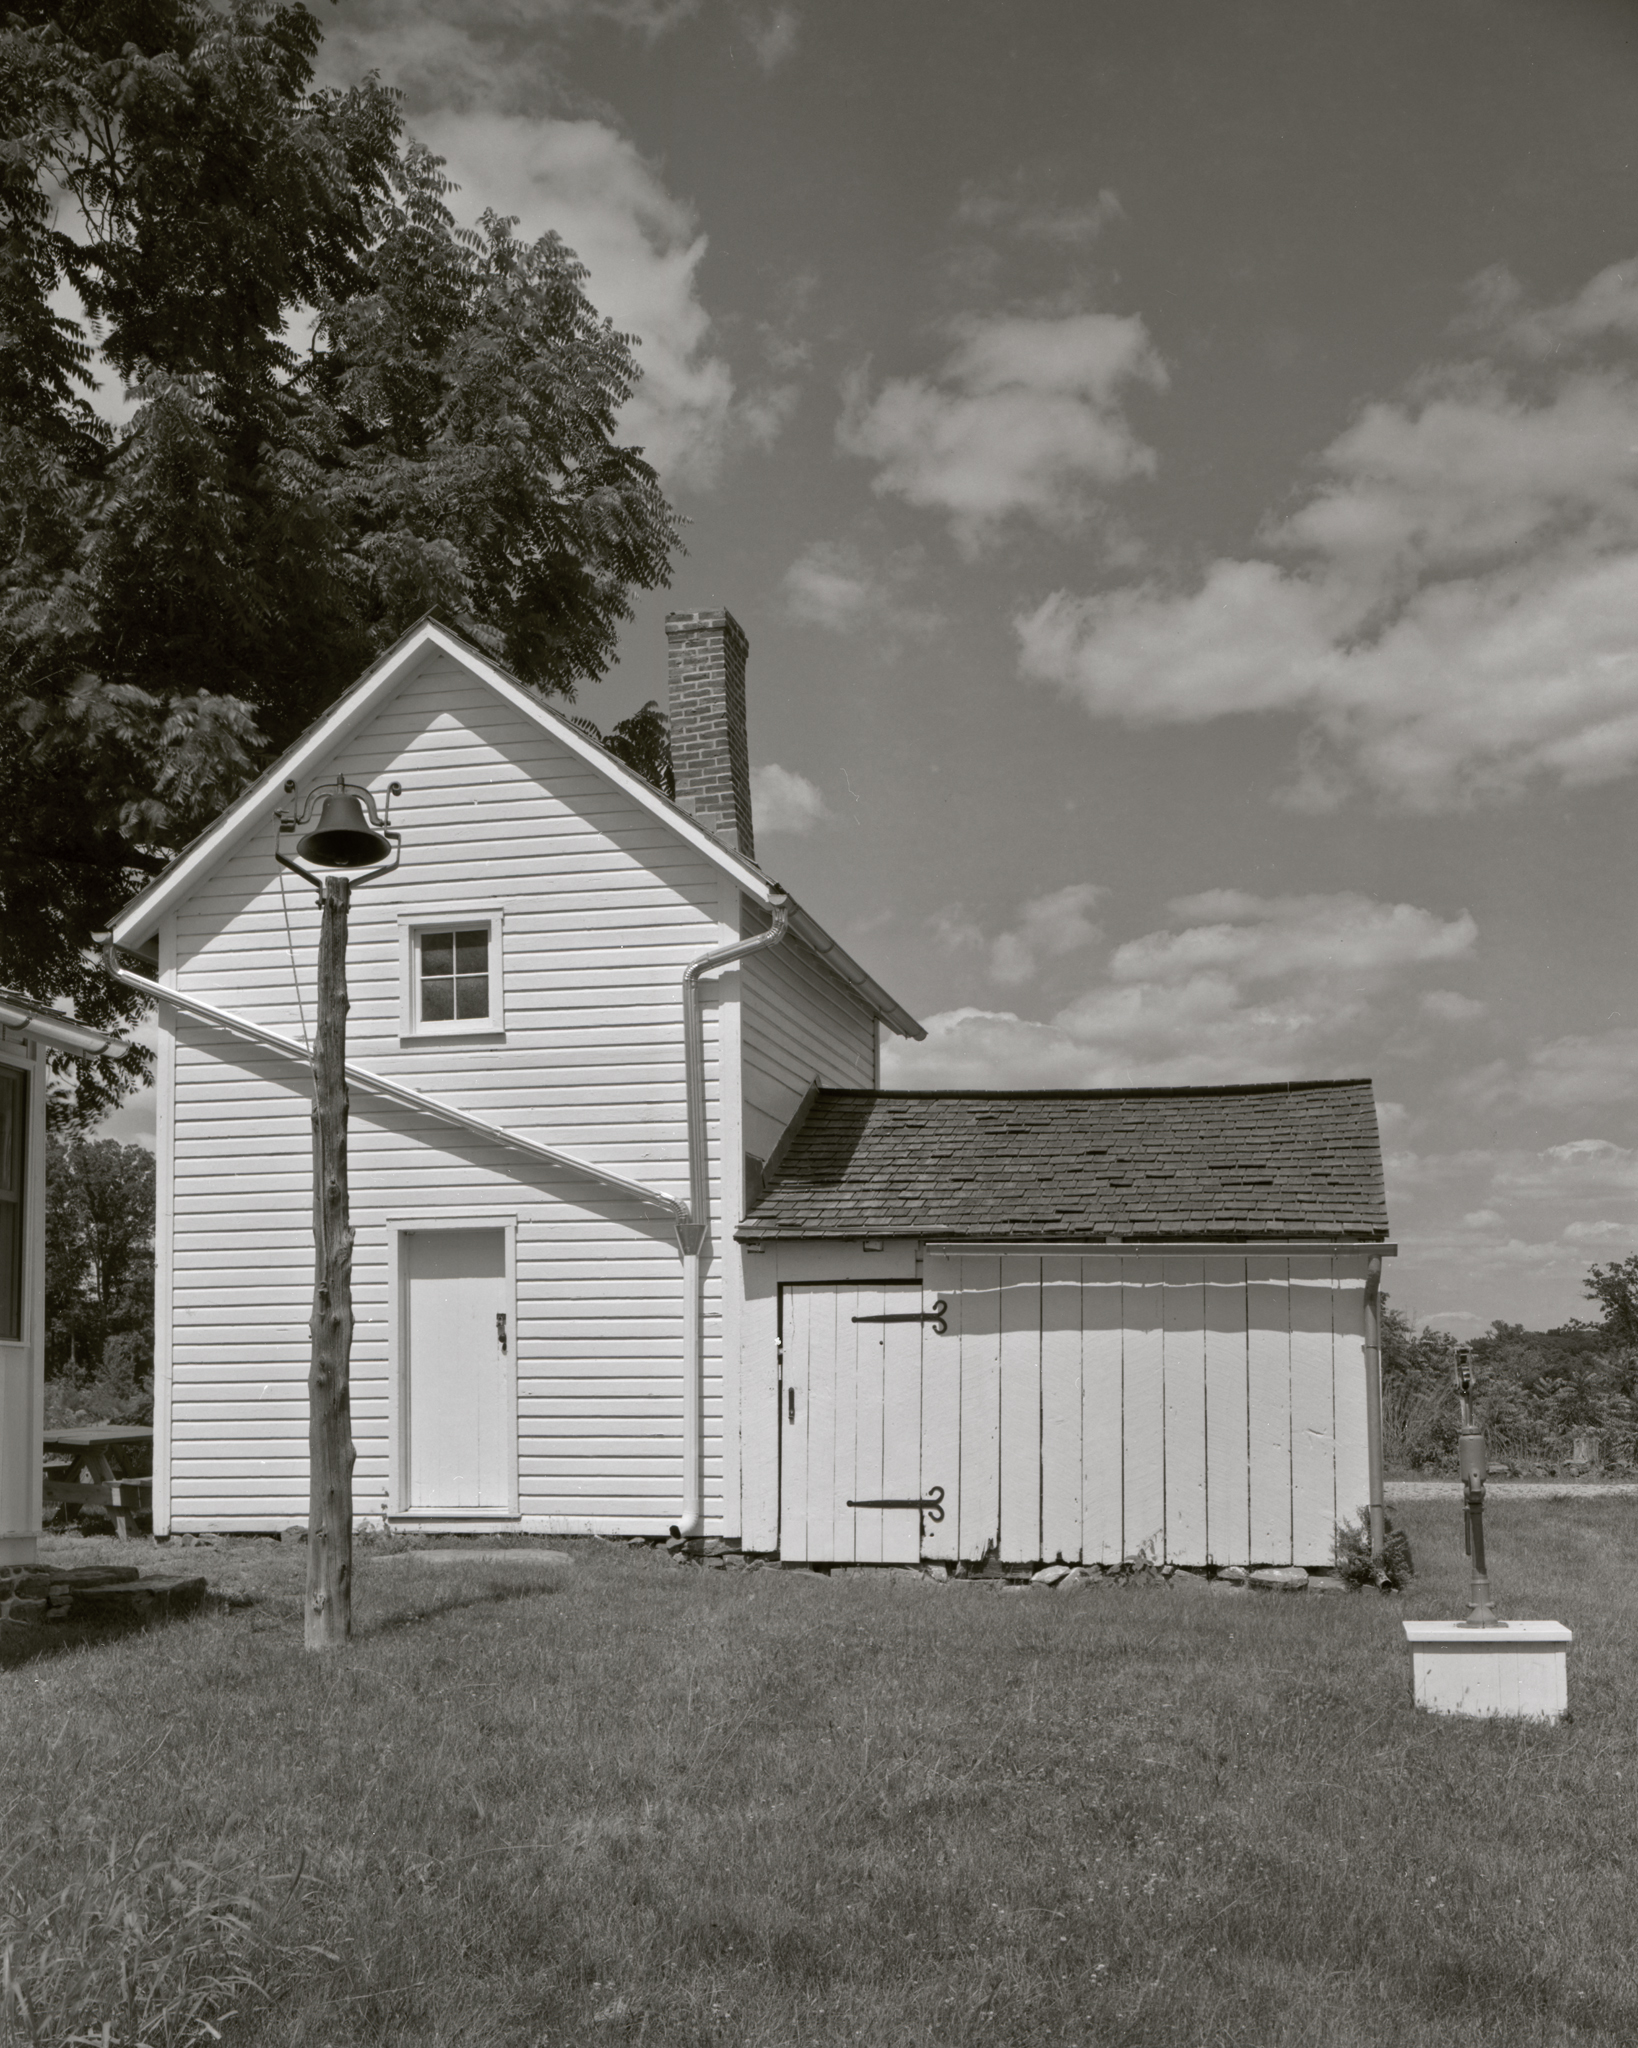 John Slyder Farm, Gettysburg Battlefield.